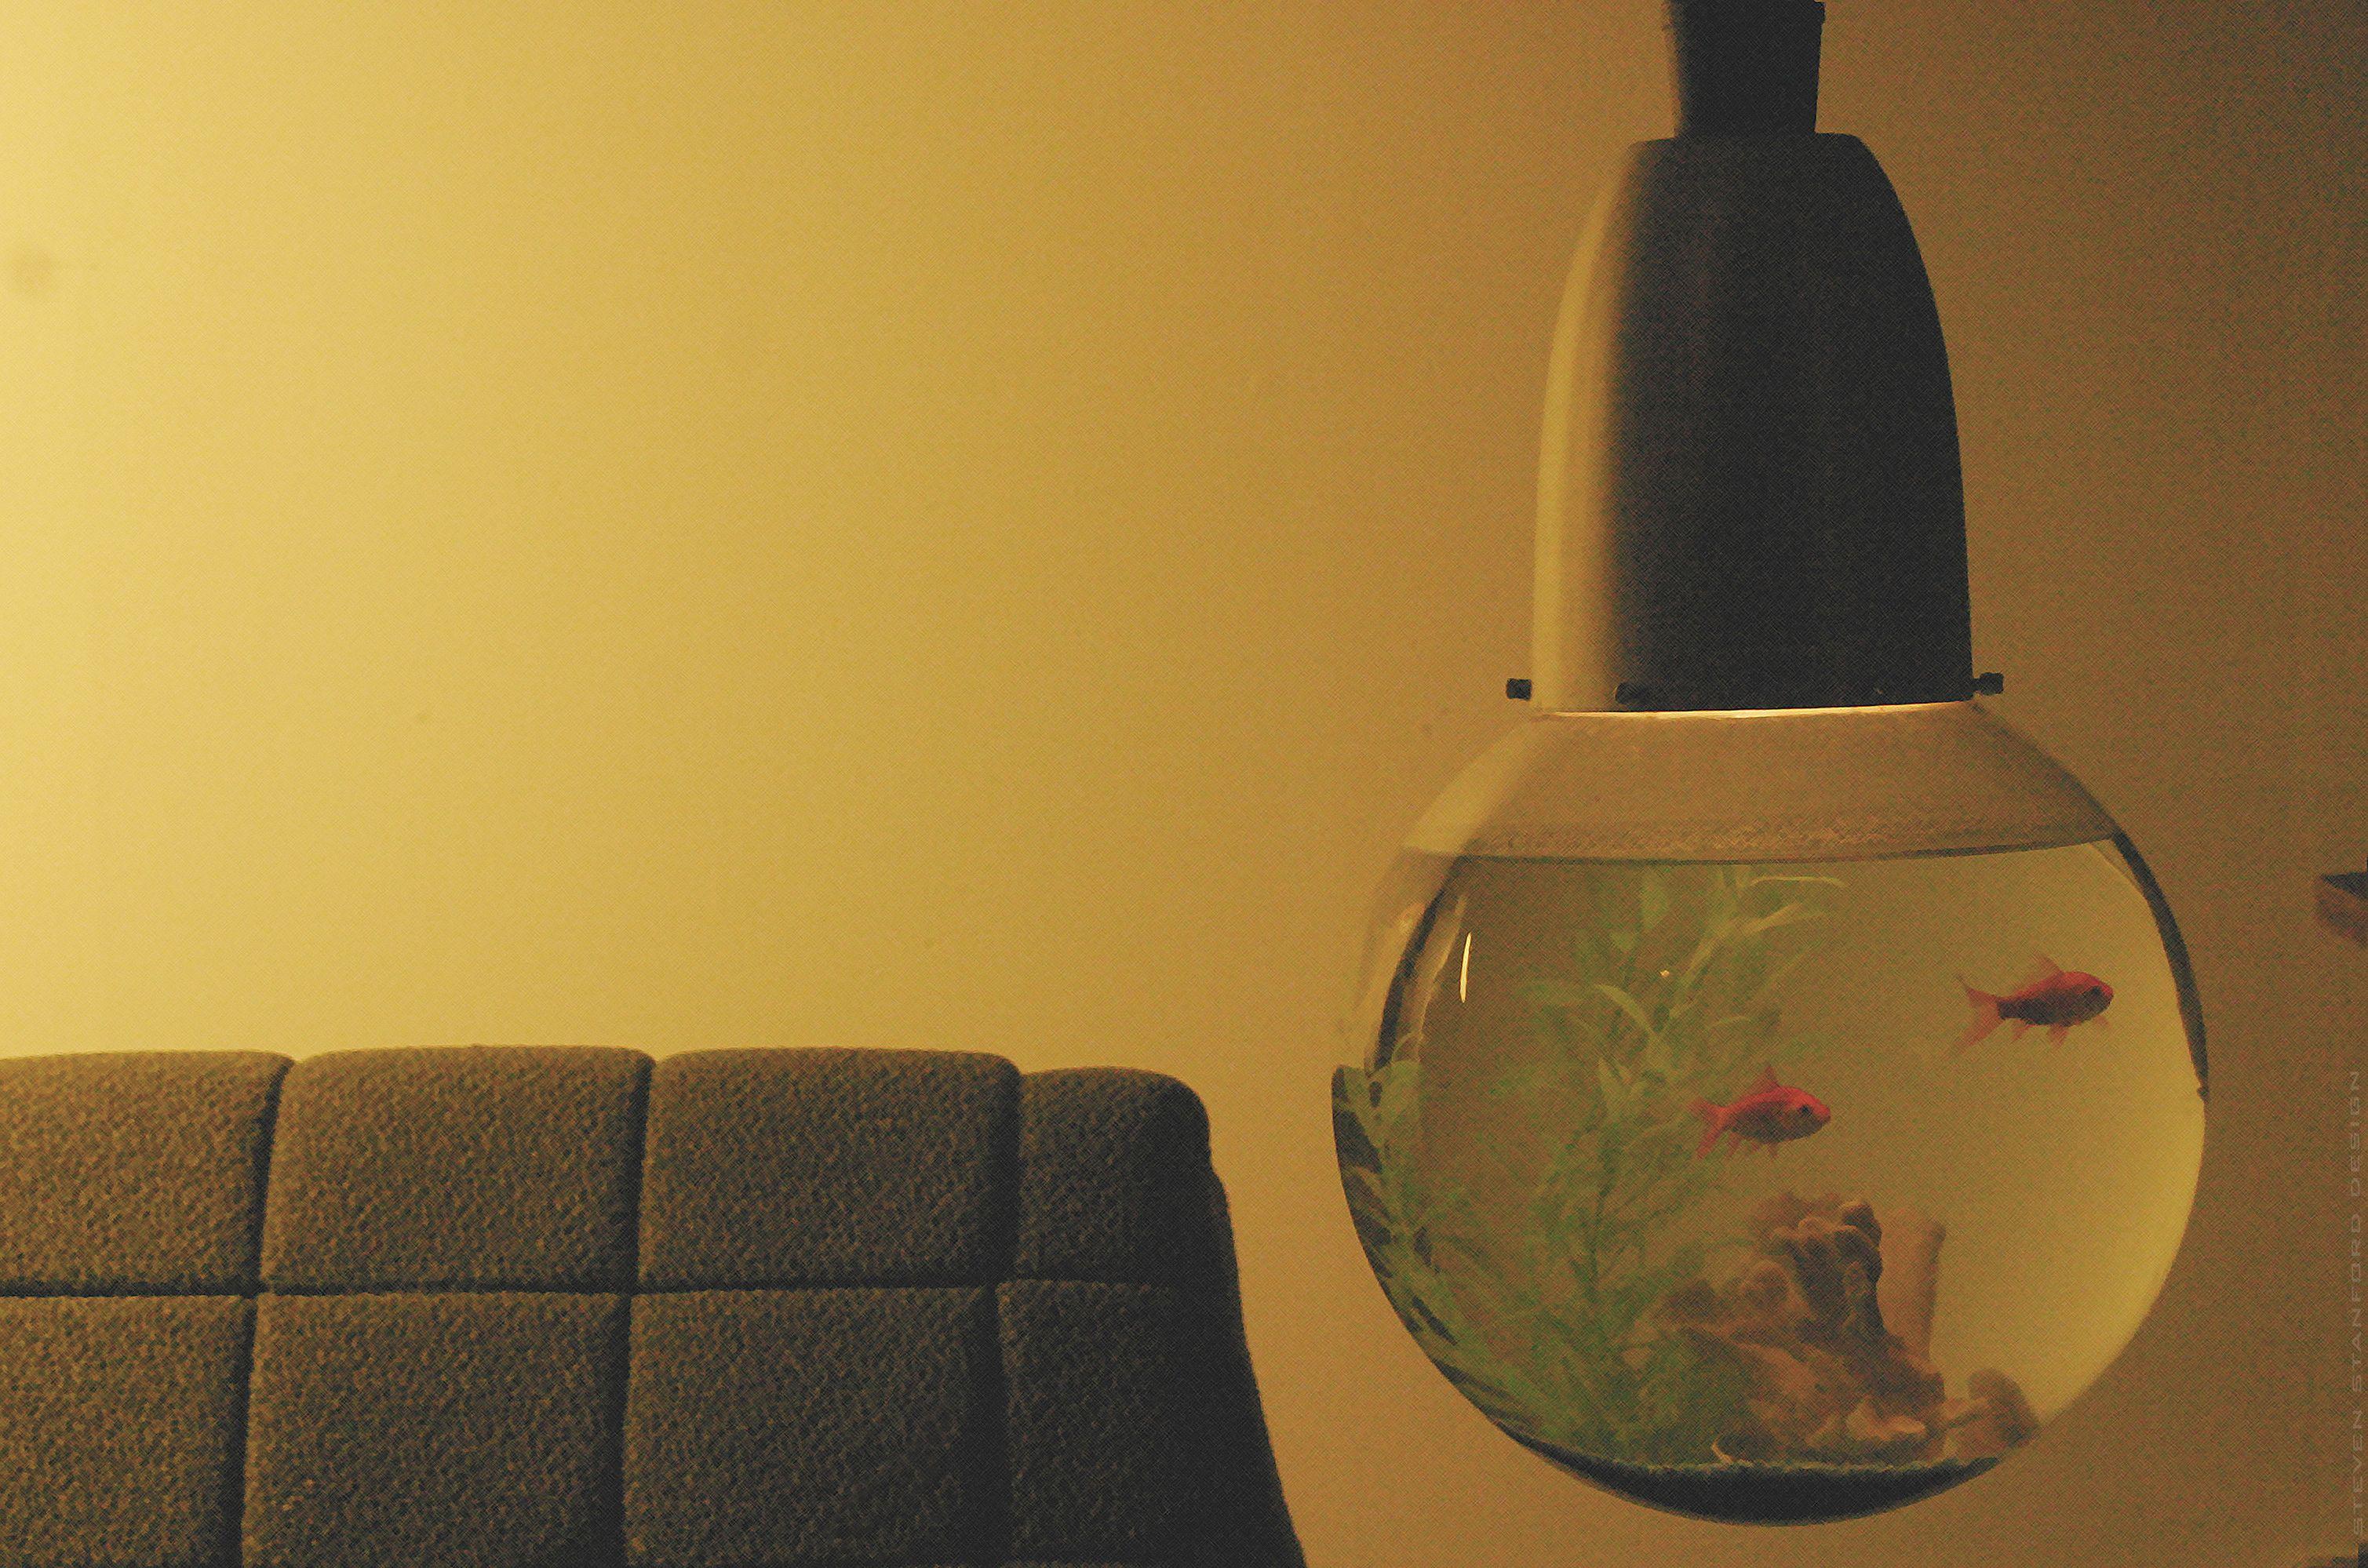 14 inch hanging aquarium lamp fish tank lamp Designed and